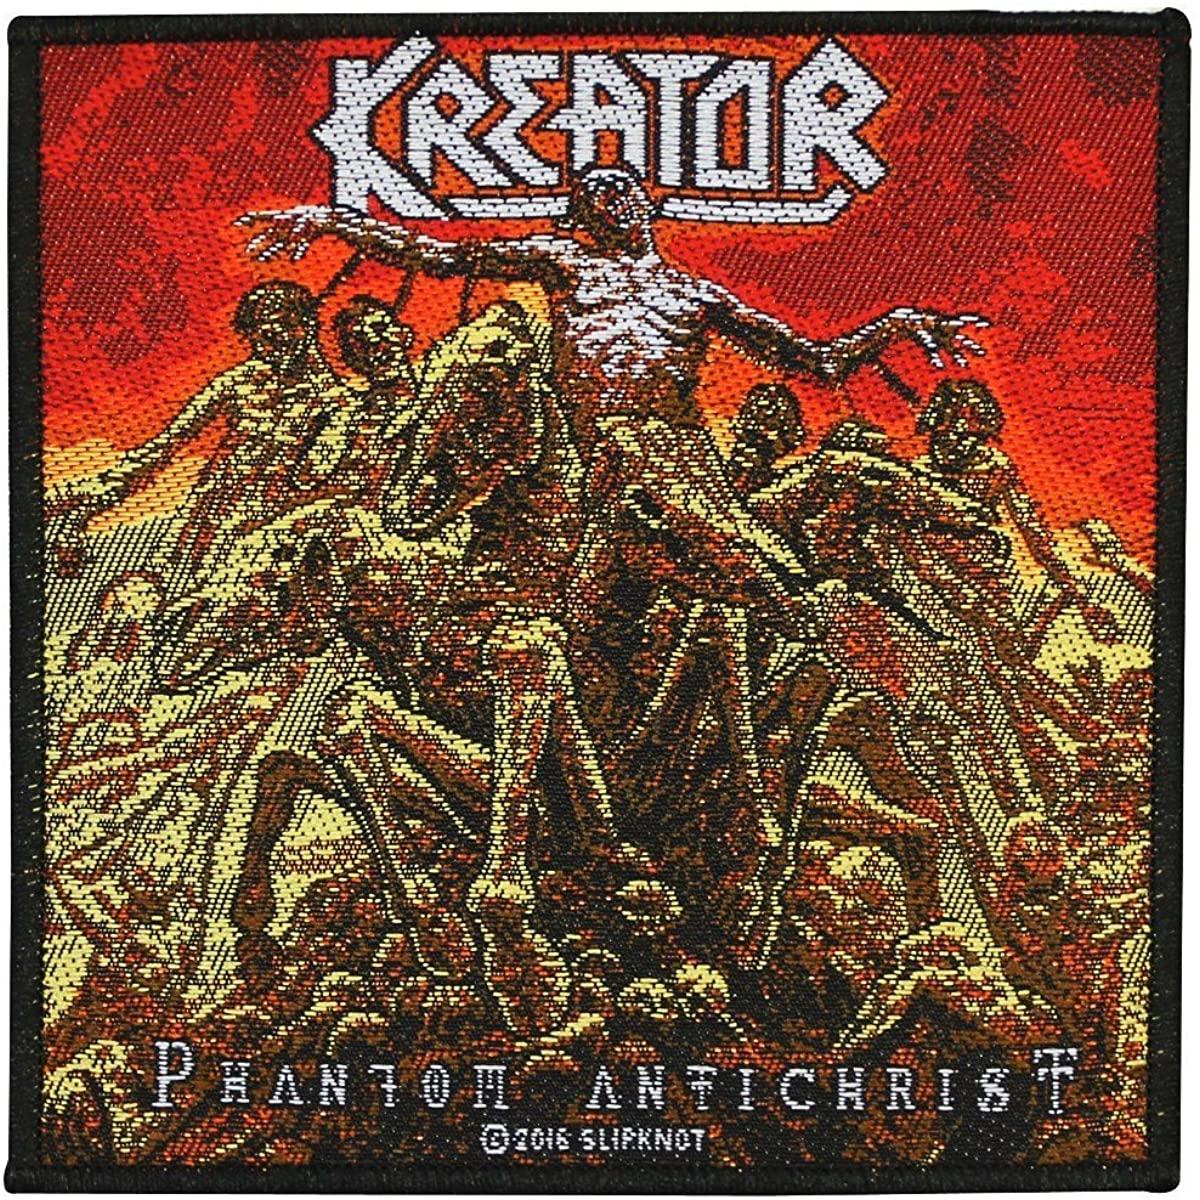 Kreator Phantom Antichrist Patch Album Art Thrash Metal Woven Sew On Applique